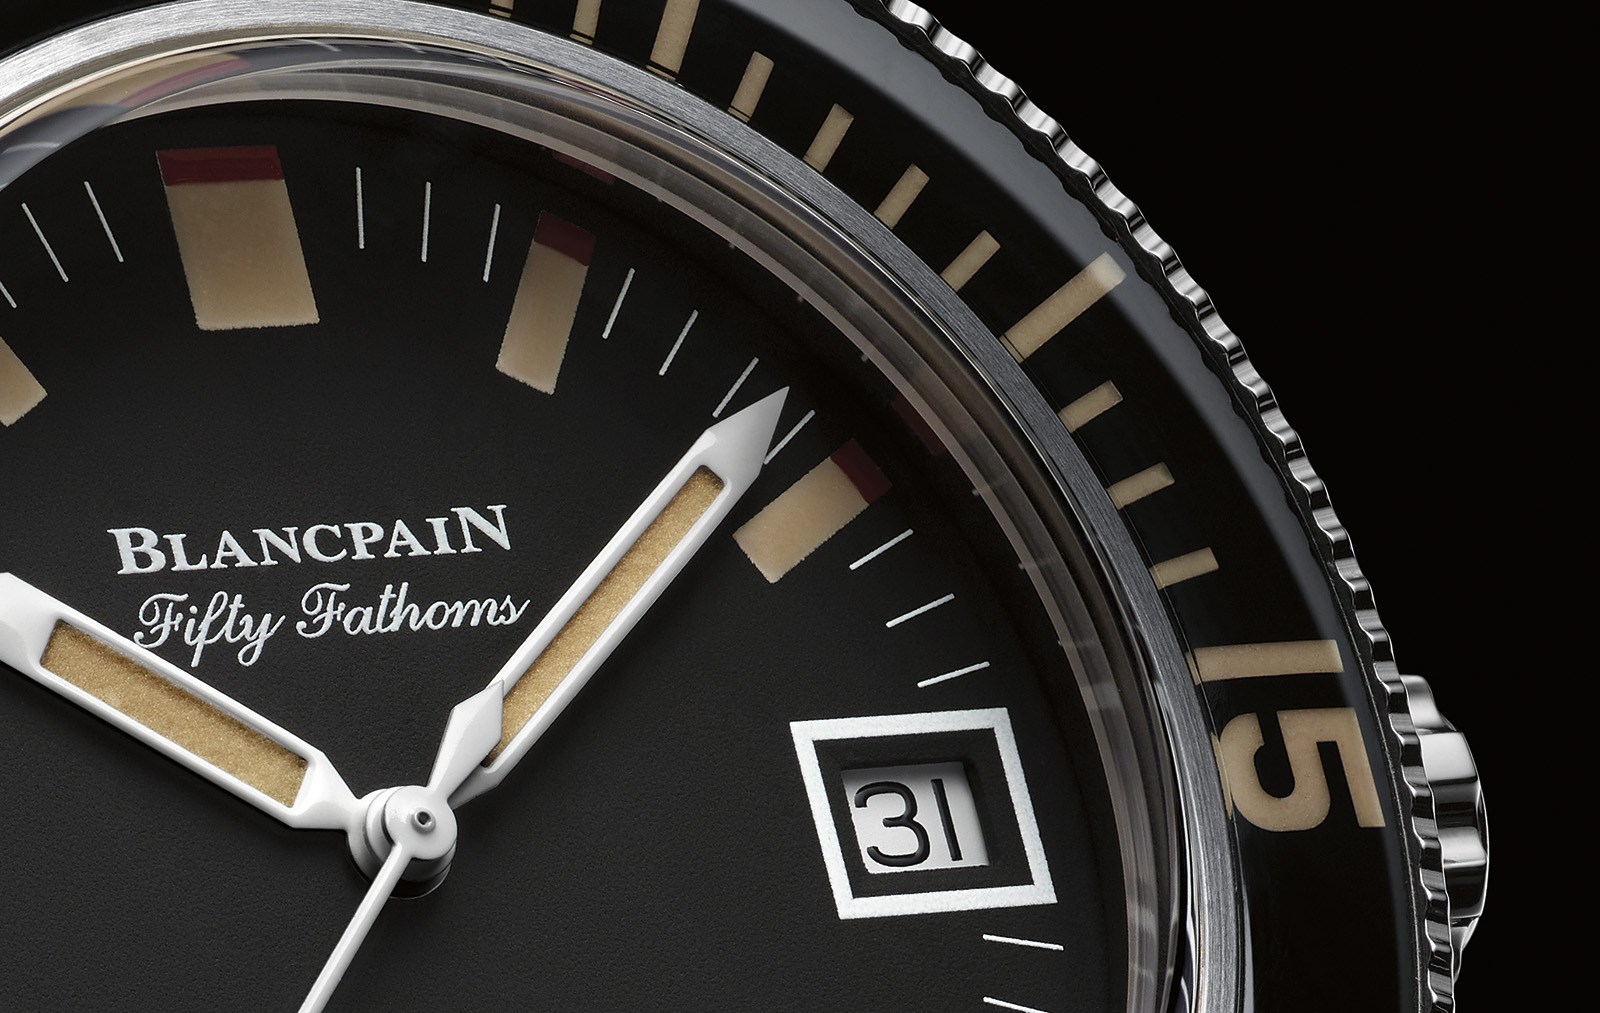 Blancpain Fifty Fathoms Barakuda